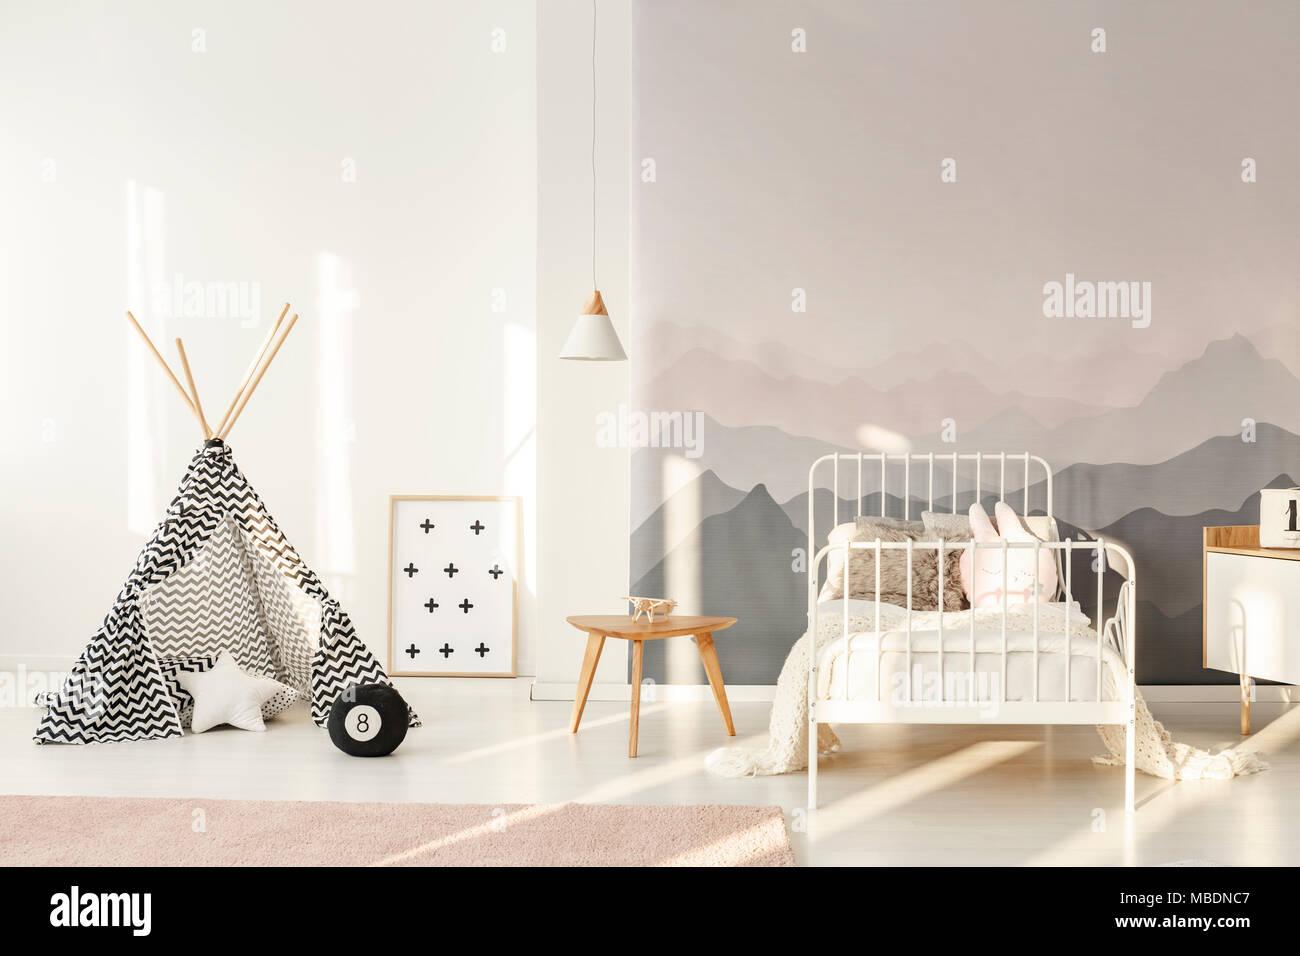 Carta Da Parati Stanza Bambini : Acquista beibehang papel de parede d carta da parati la stanza